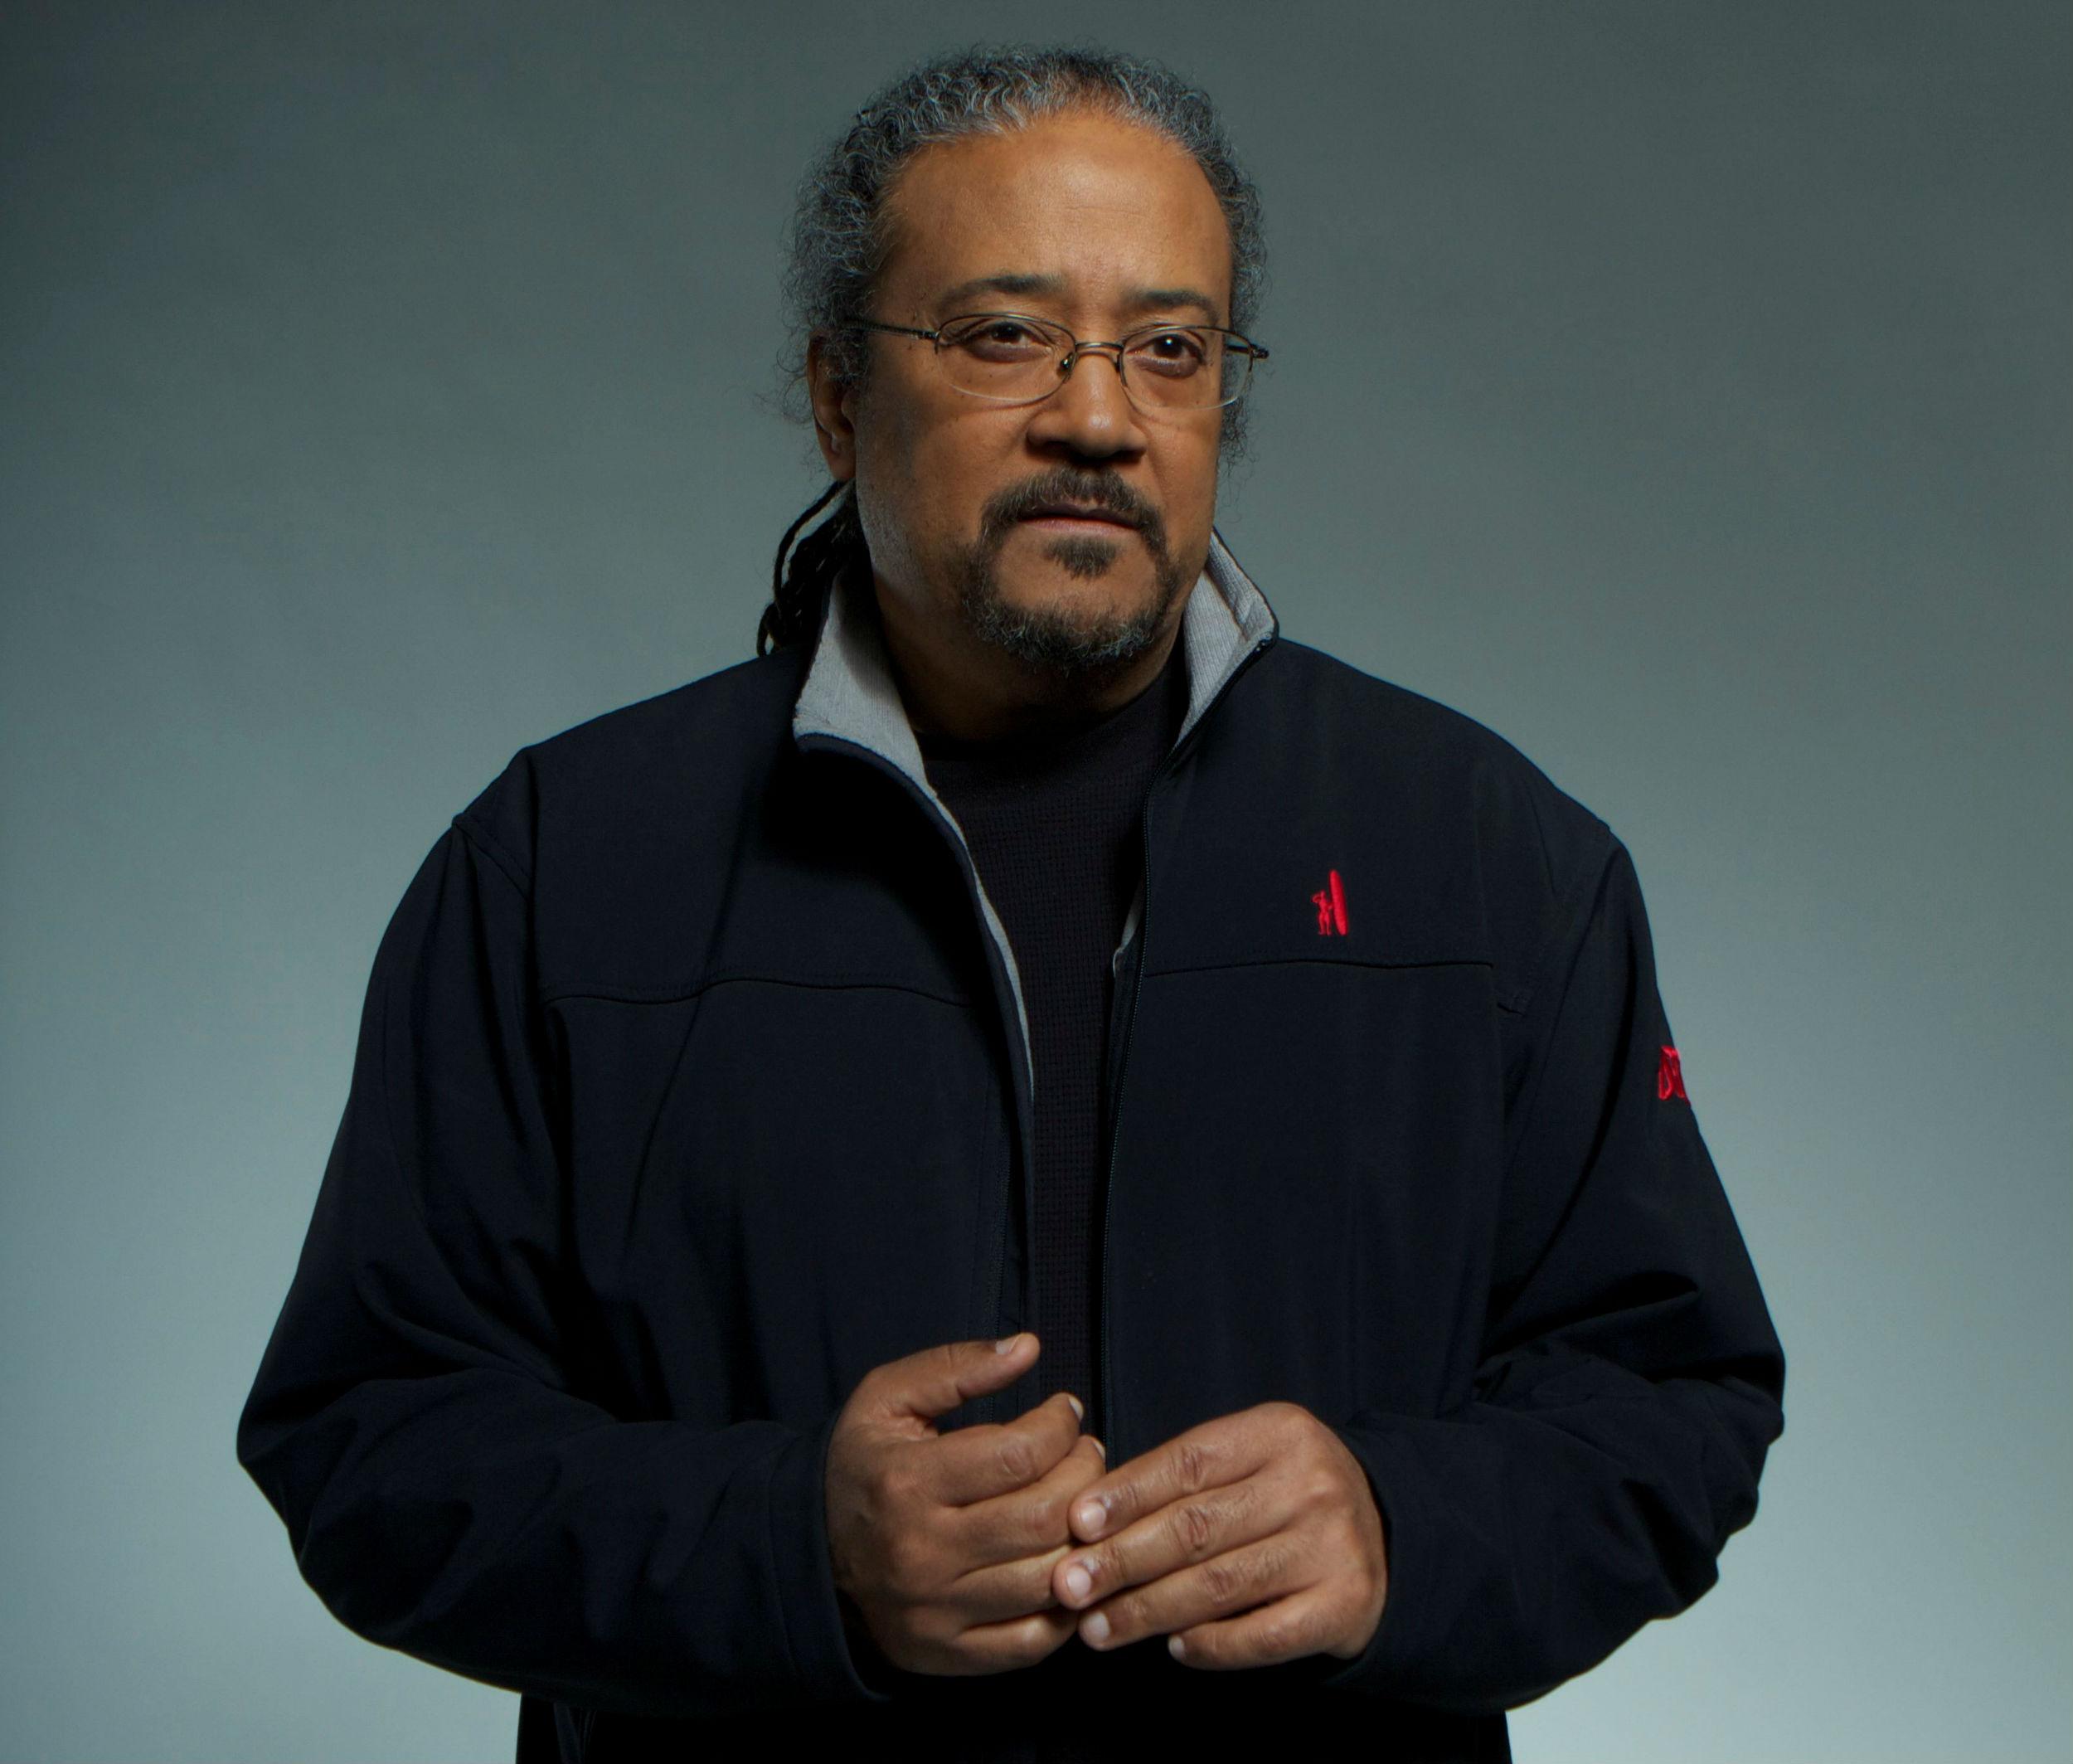 Director Ernest Dickerson